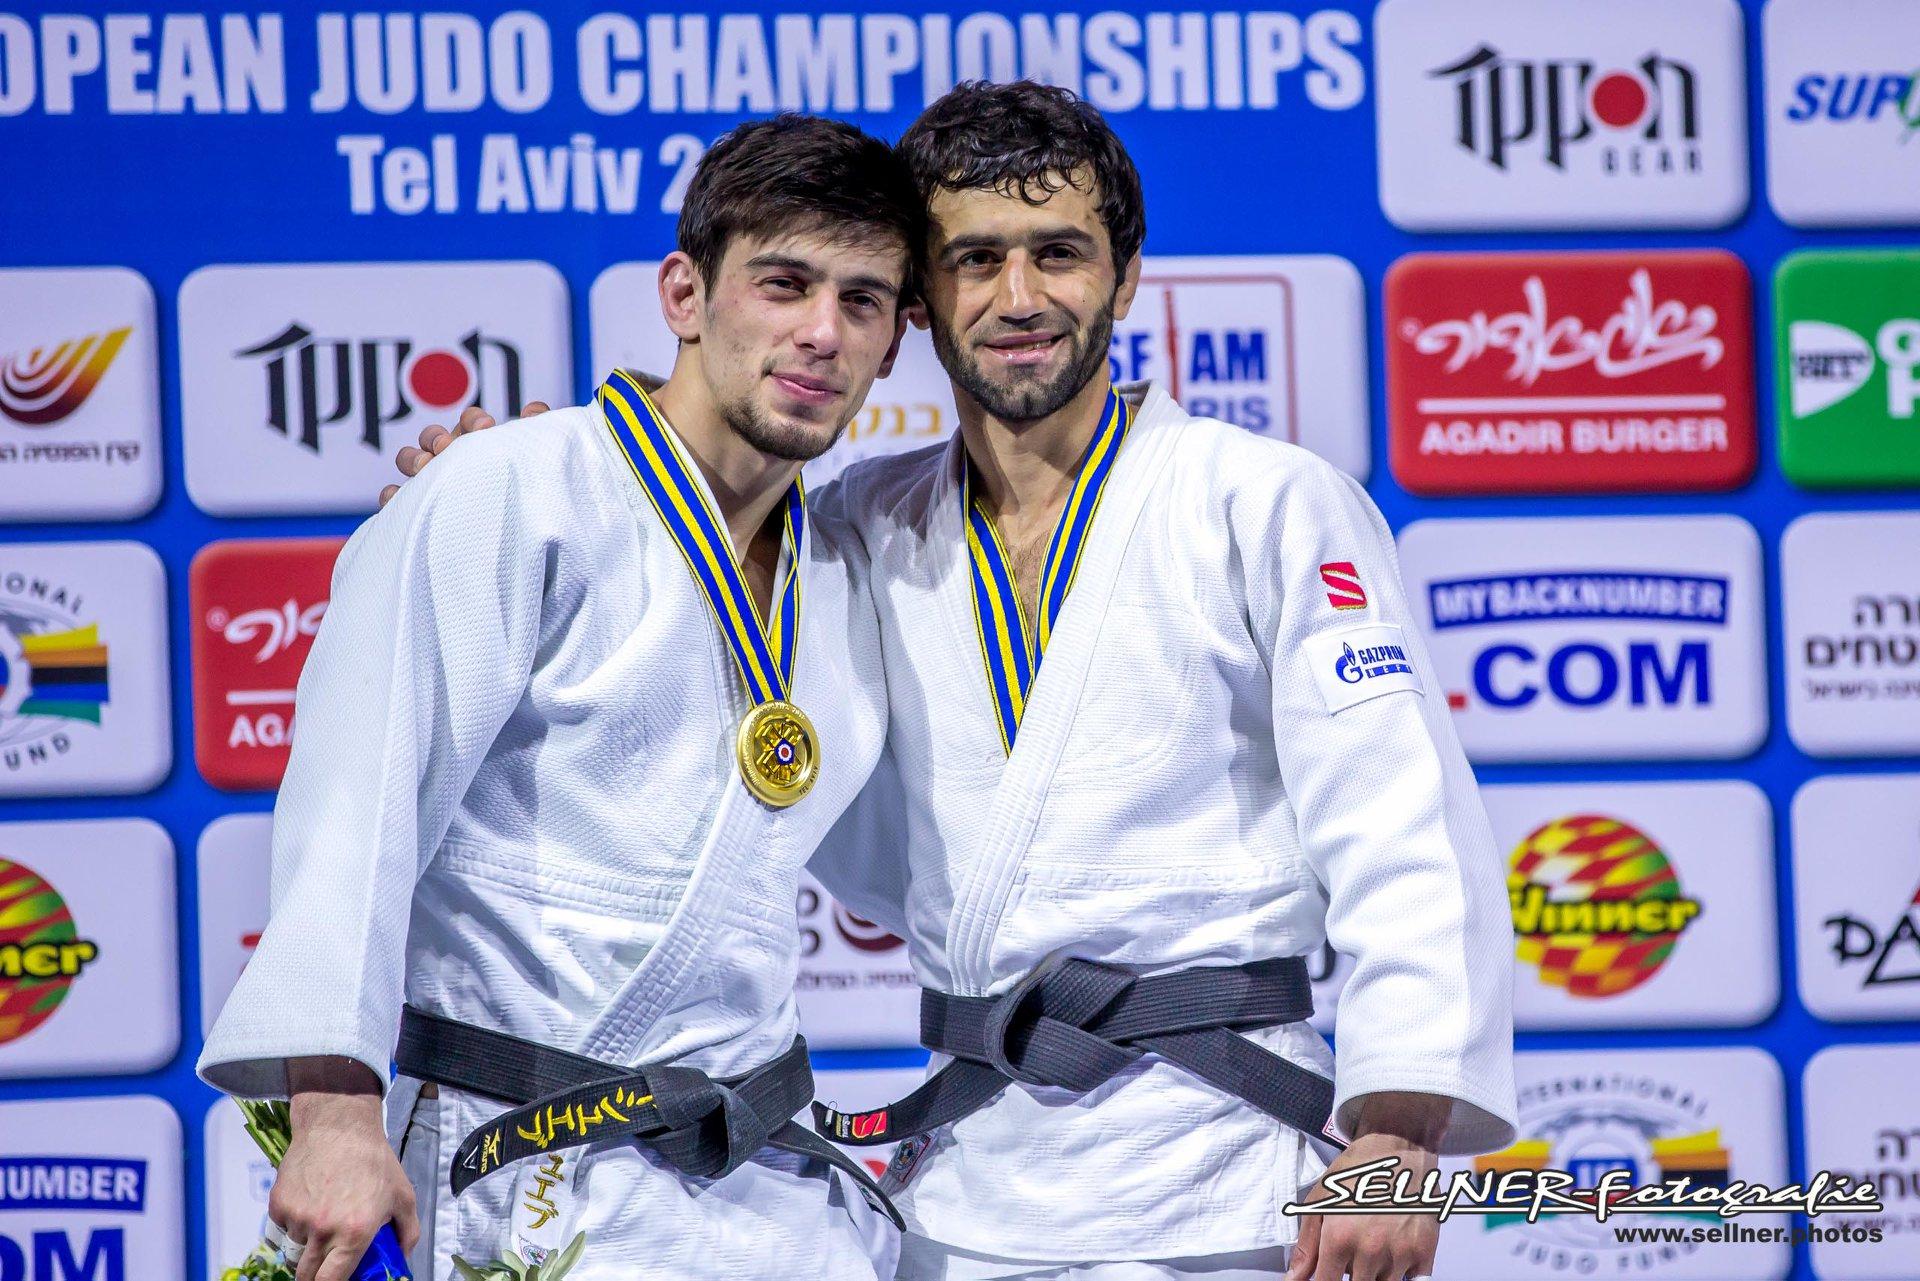 20180426_ech_telaviv_os_60_podium_islam_yashuev_beslan_mudranov